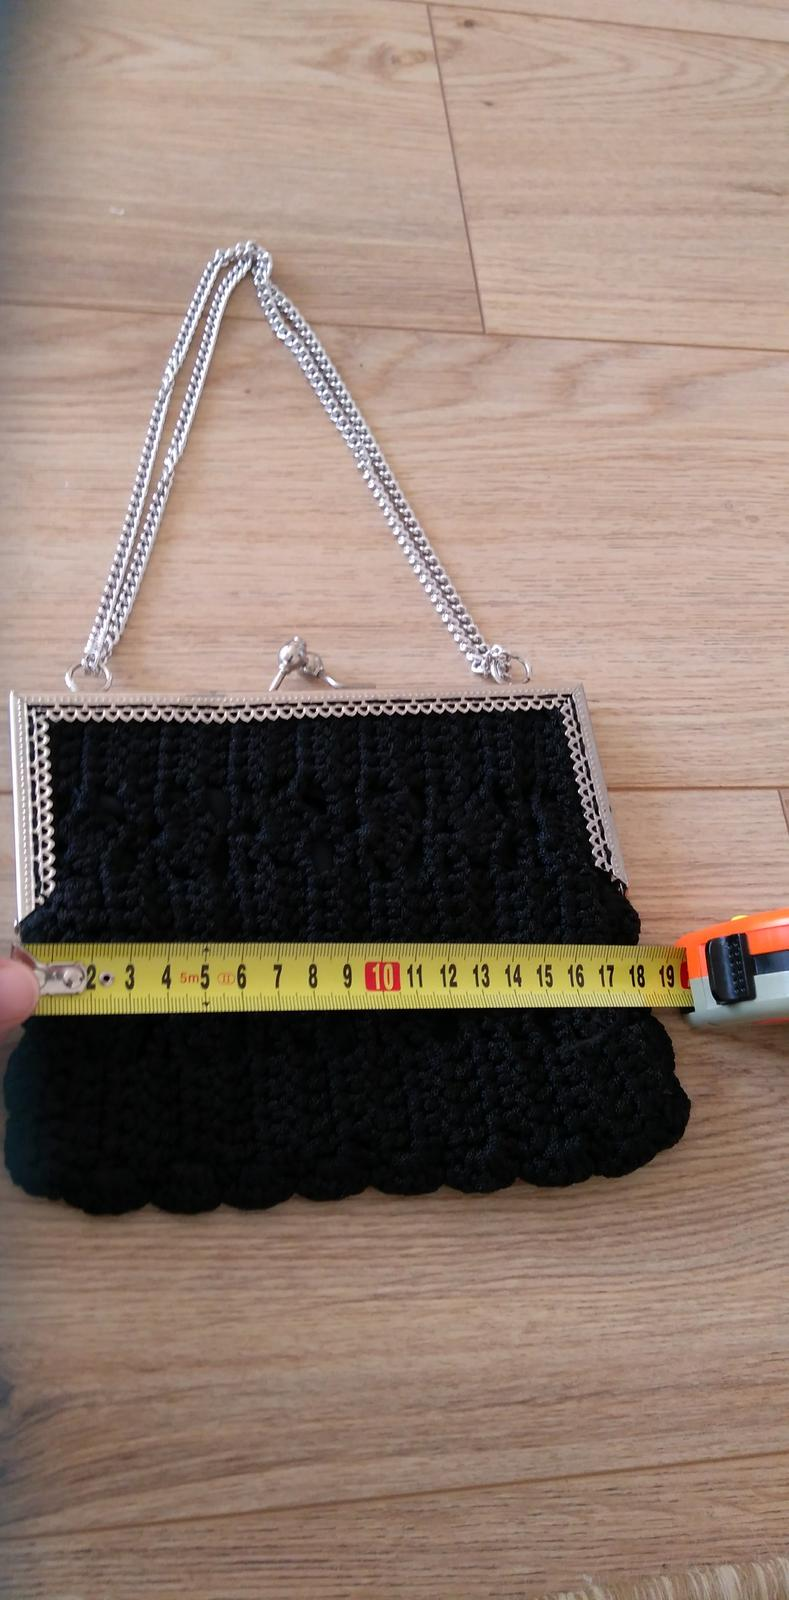 Čierna kabelka - Obrázok č. 2